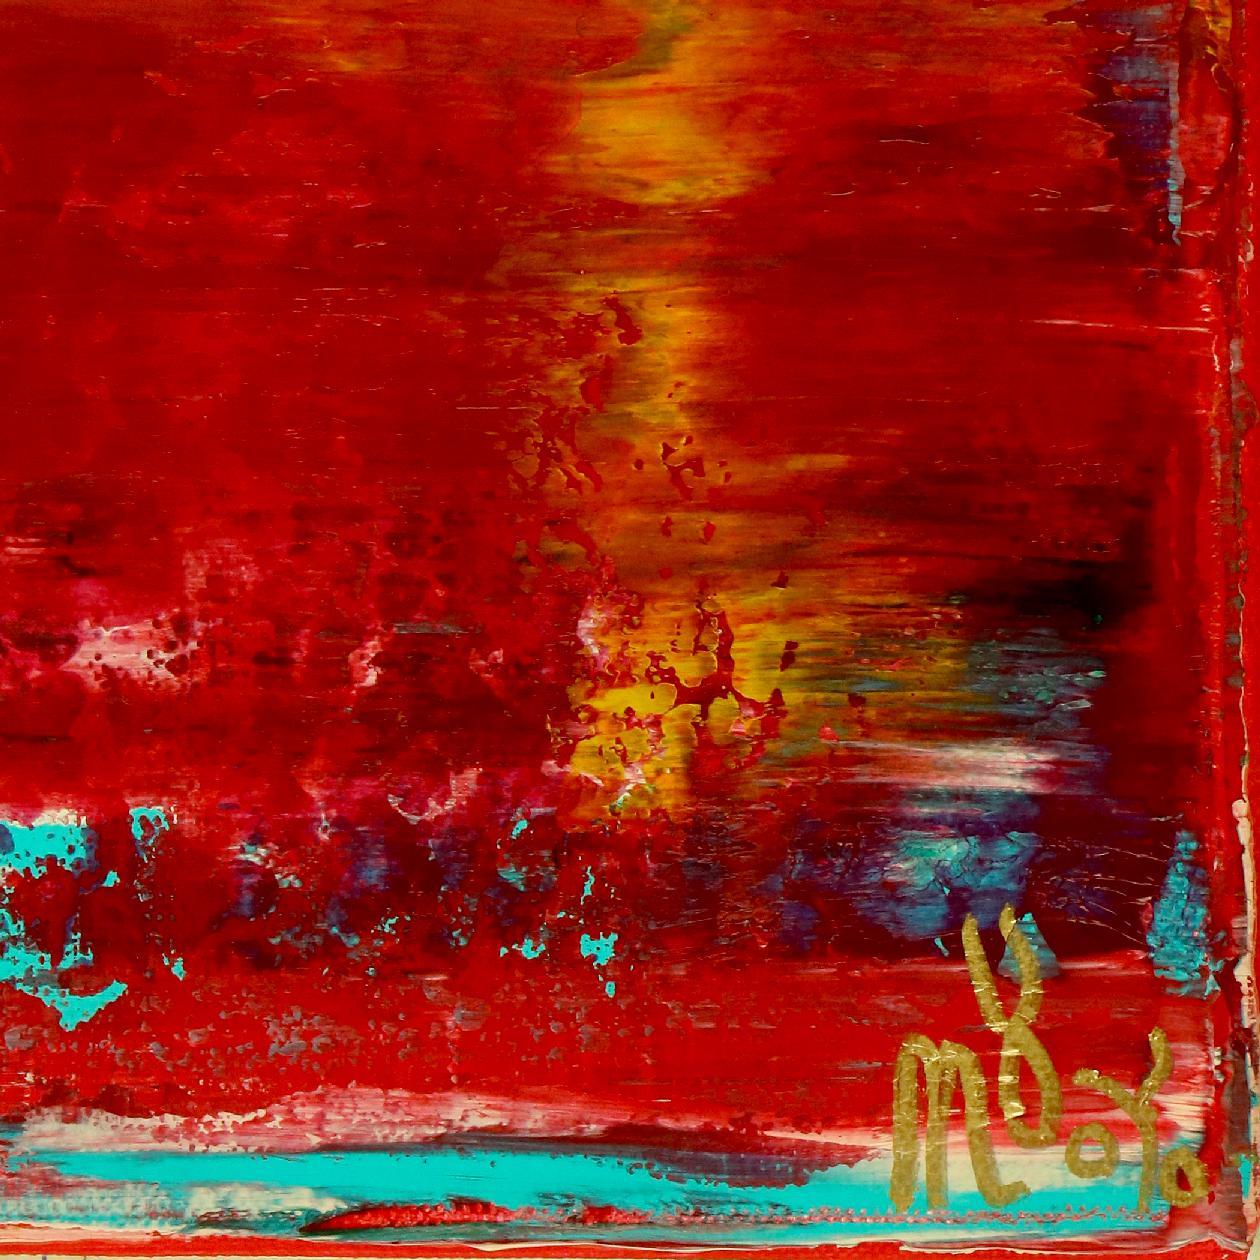 Rojo Infinito (Fiery Spectra) #2 (2020) by Nestor Toro